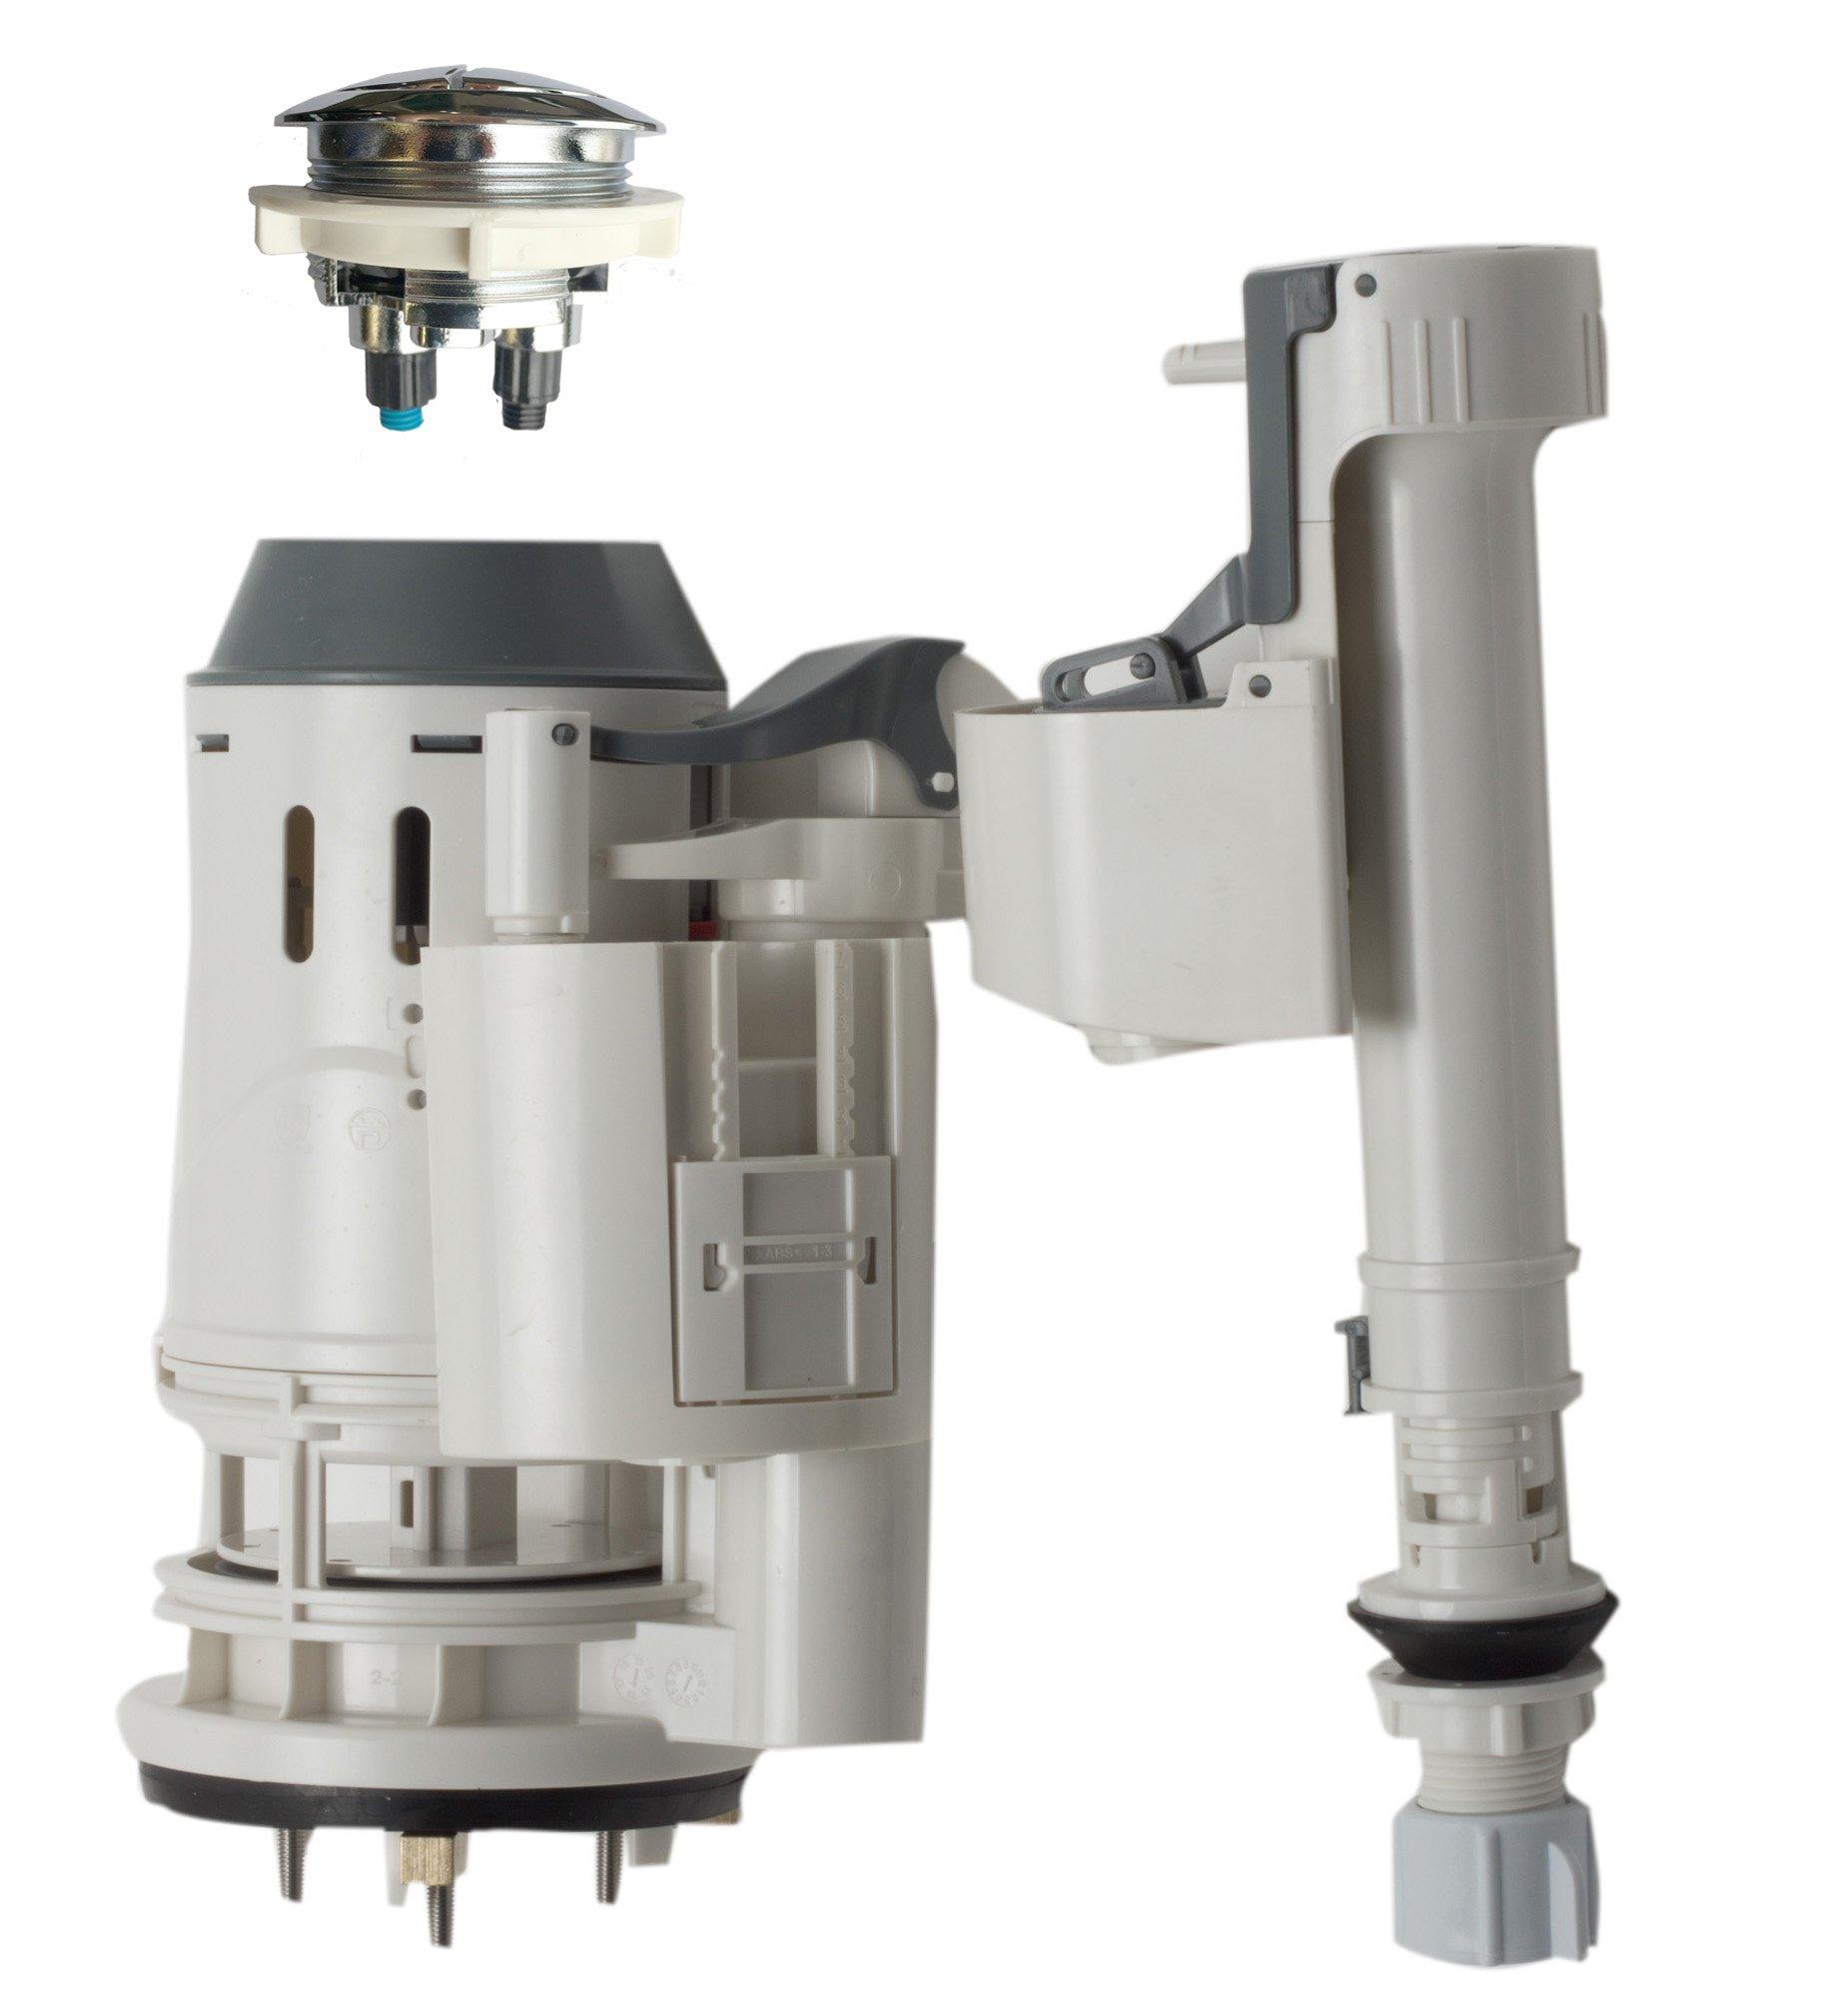 EAGO R-351FLUSH Replacement Toilet Flushing Mechanism for TB351 by EAGO